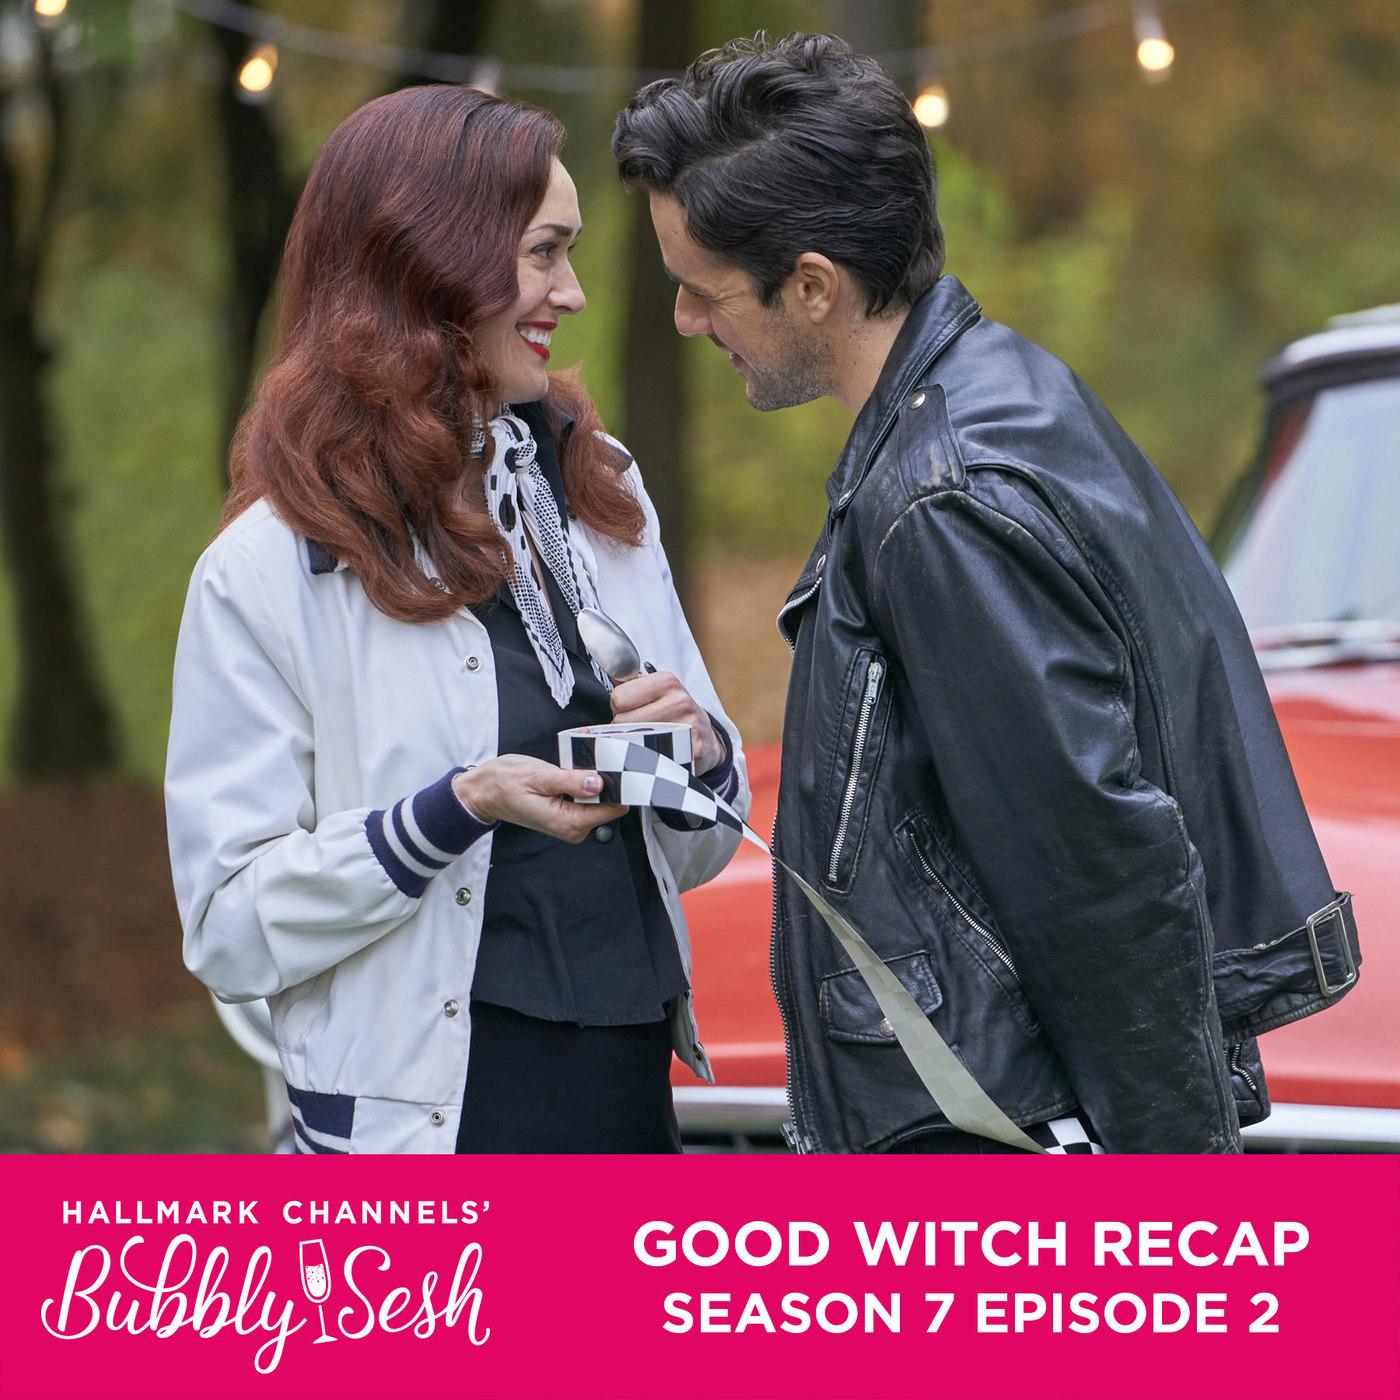 Good Witch Season 7 Episode 2 Recap